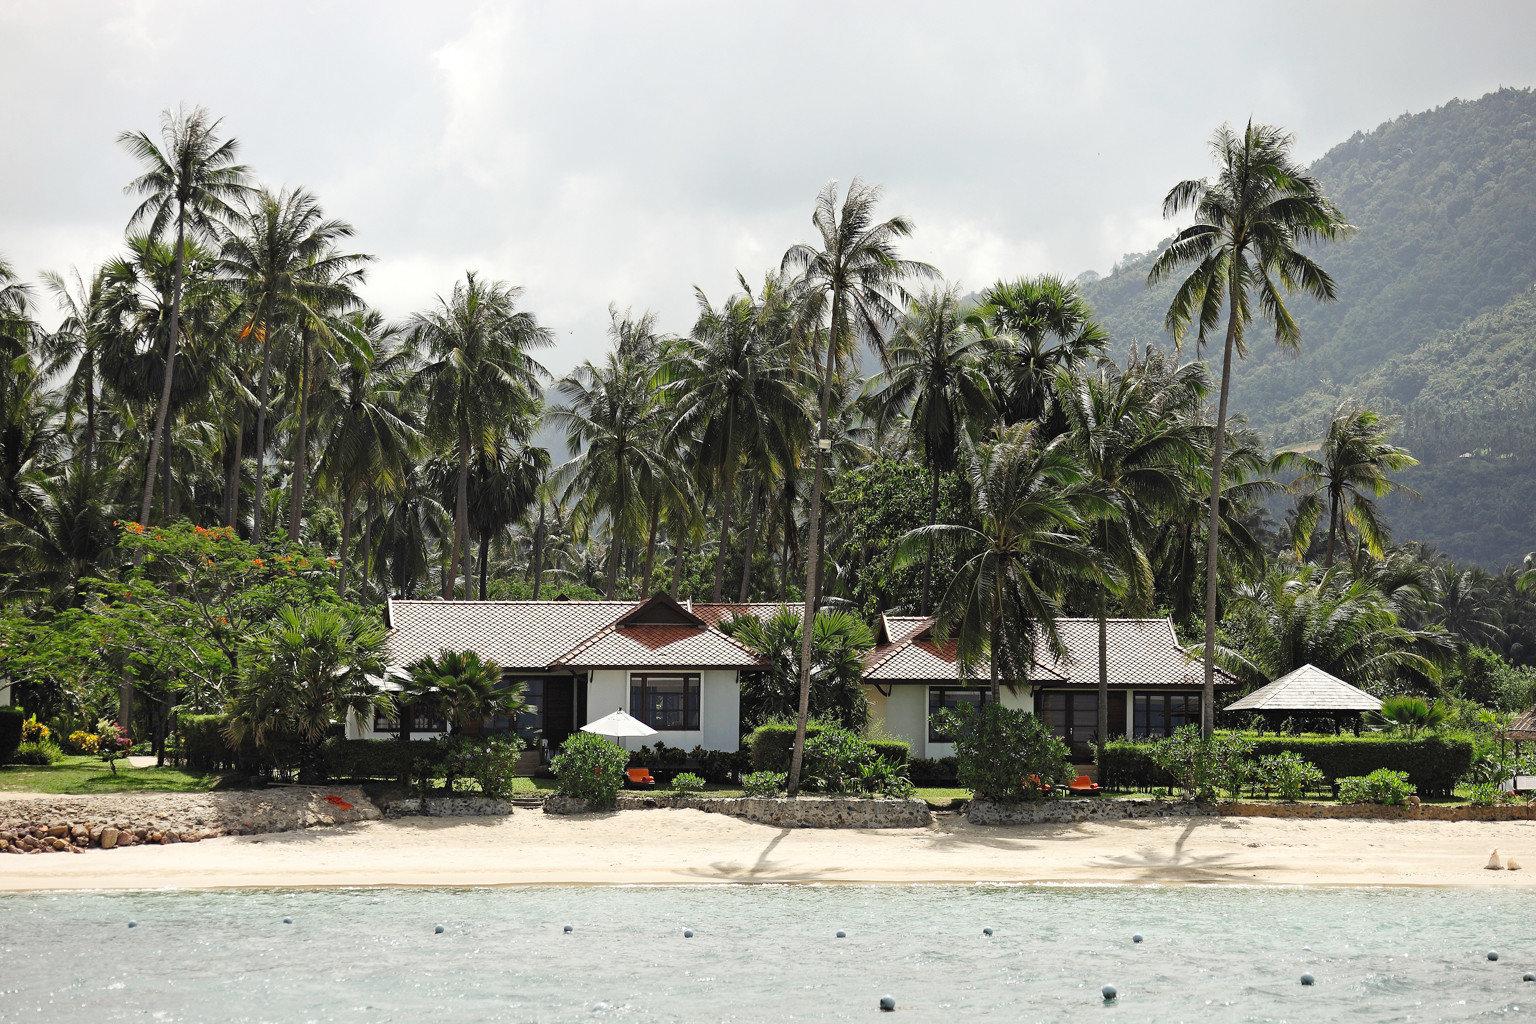 Beach Beachfront Exterior Ocean tree ground Resort arecales tropics caribbean Village plant Sea palm family Island palm